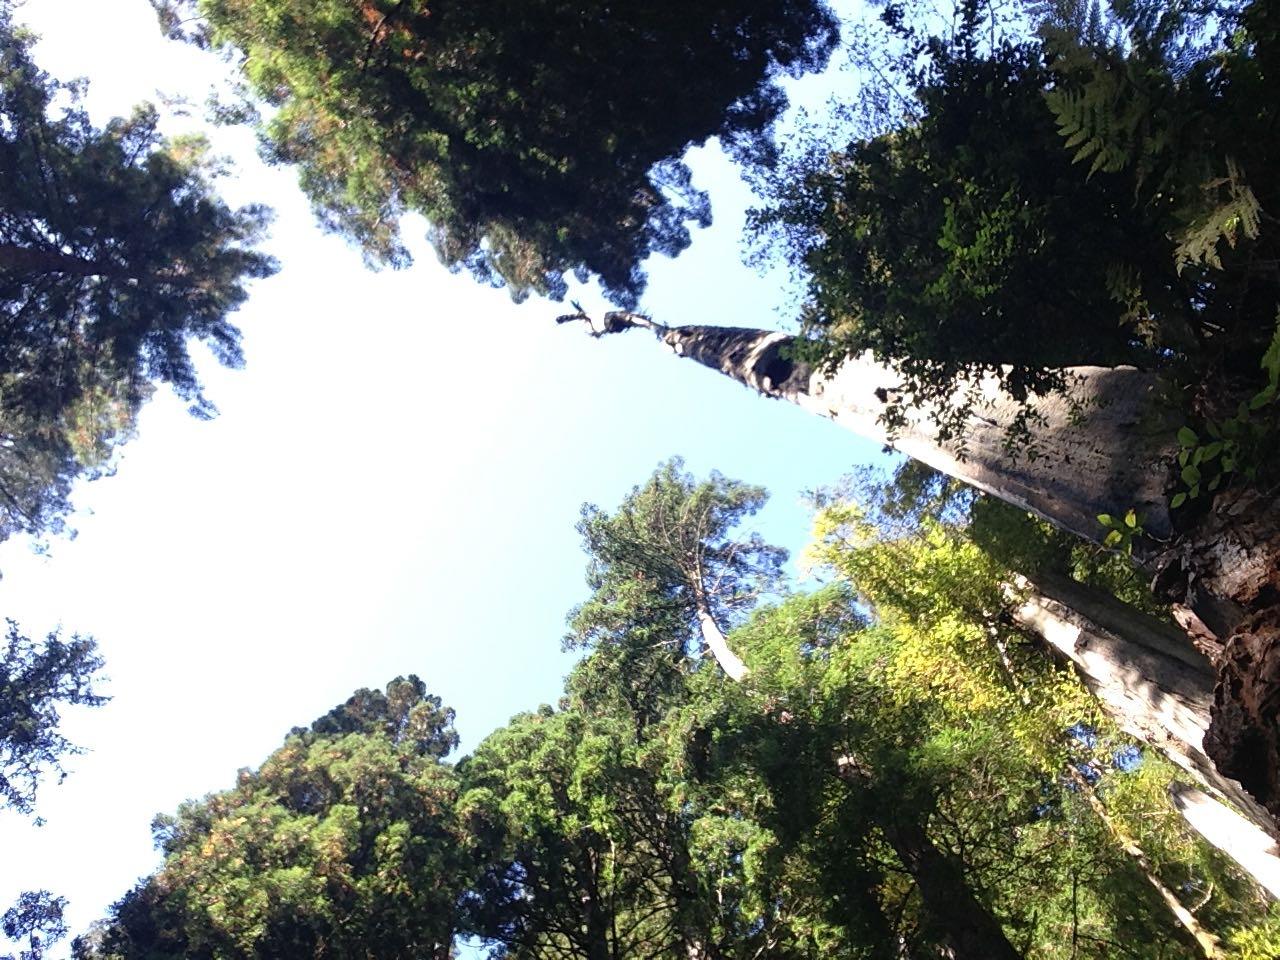 Redwoods 2017 10 08 255 Of 287